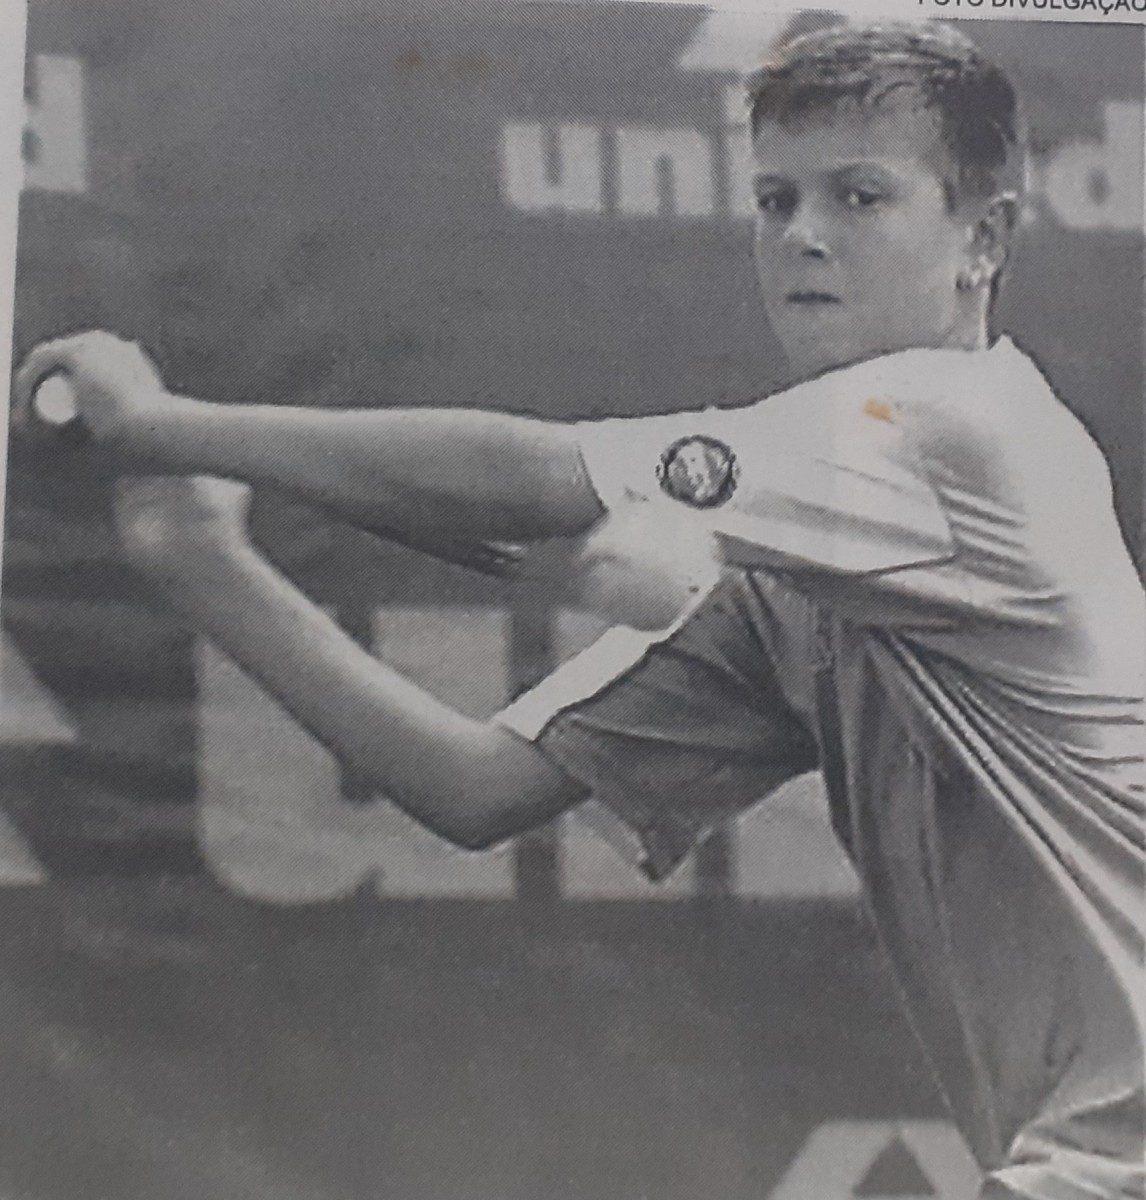 André Baran tênis campeonato tenista brusque